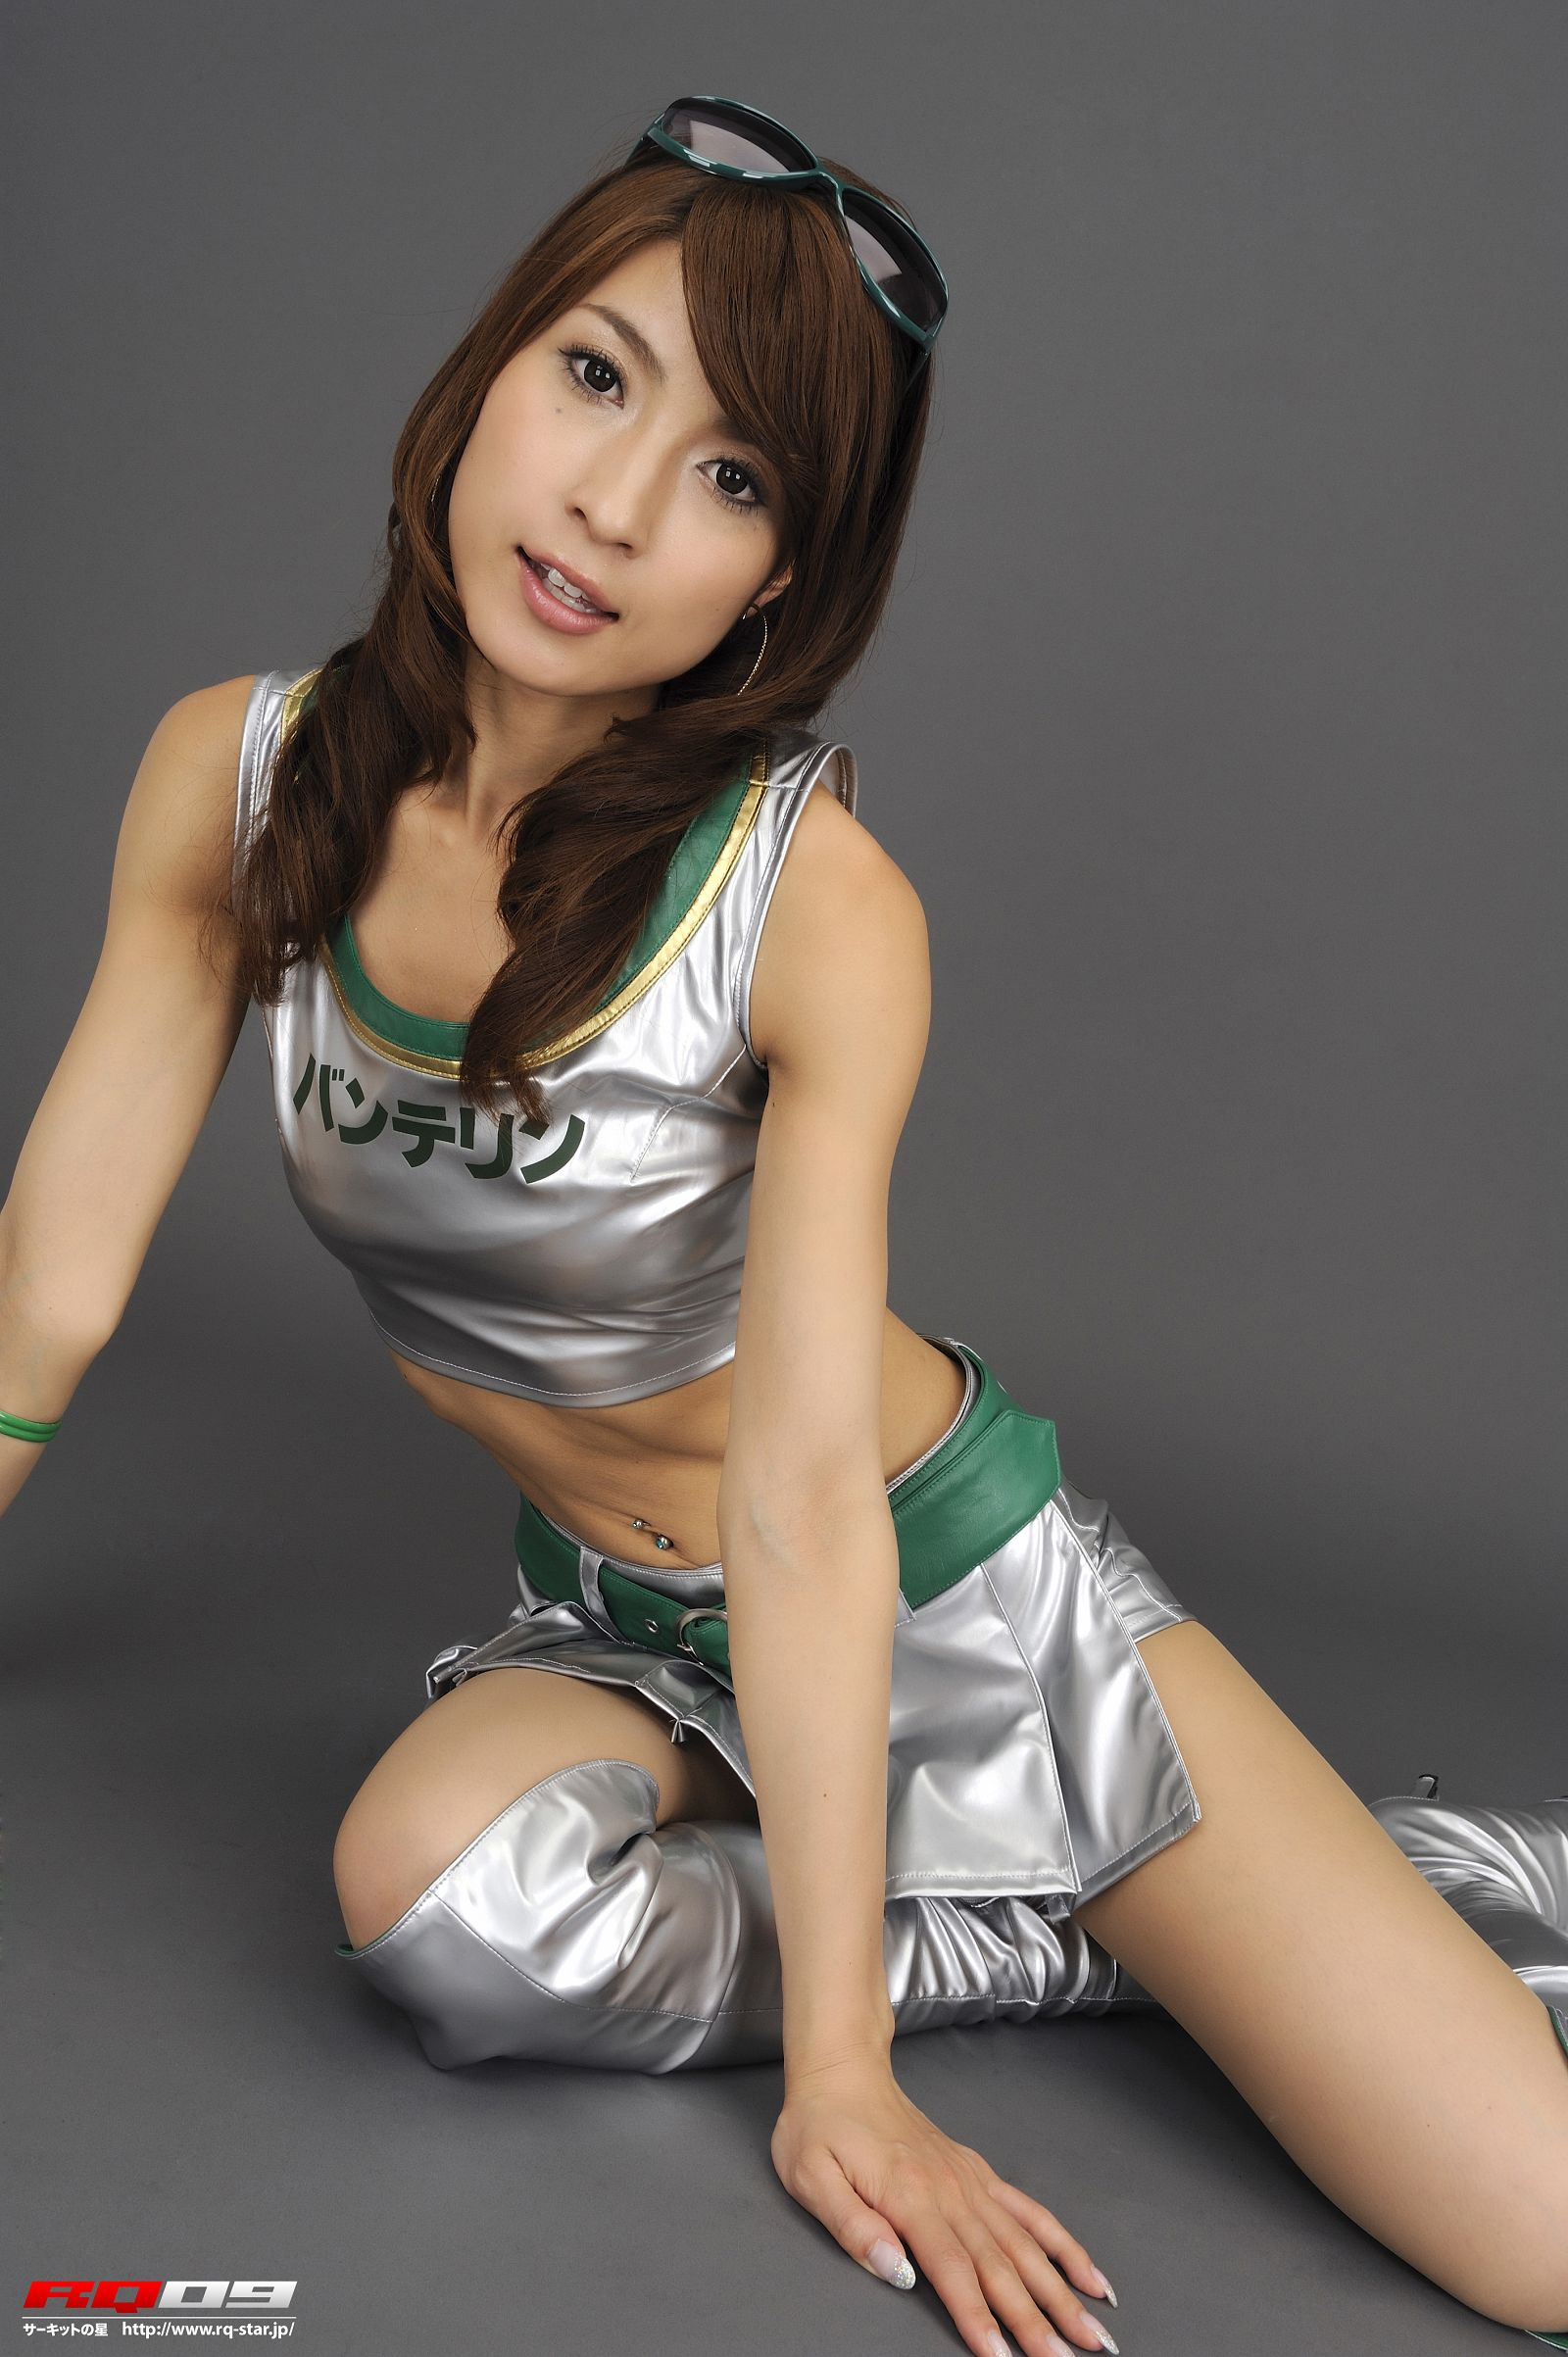 [RQ-STAR美女] NO.0151 Chisaki Takahashi 高橋千咲姫 Race Queen3